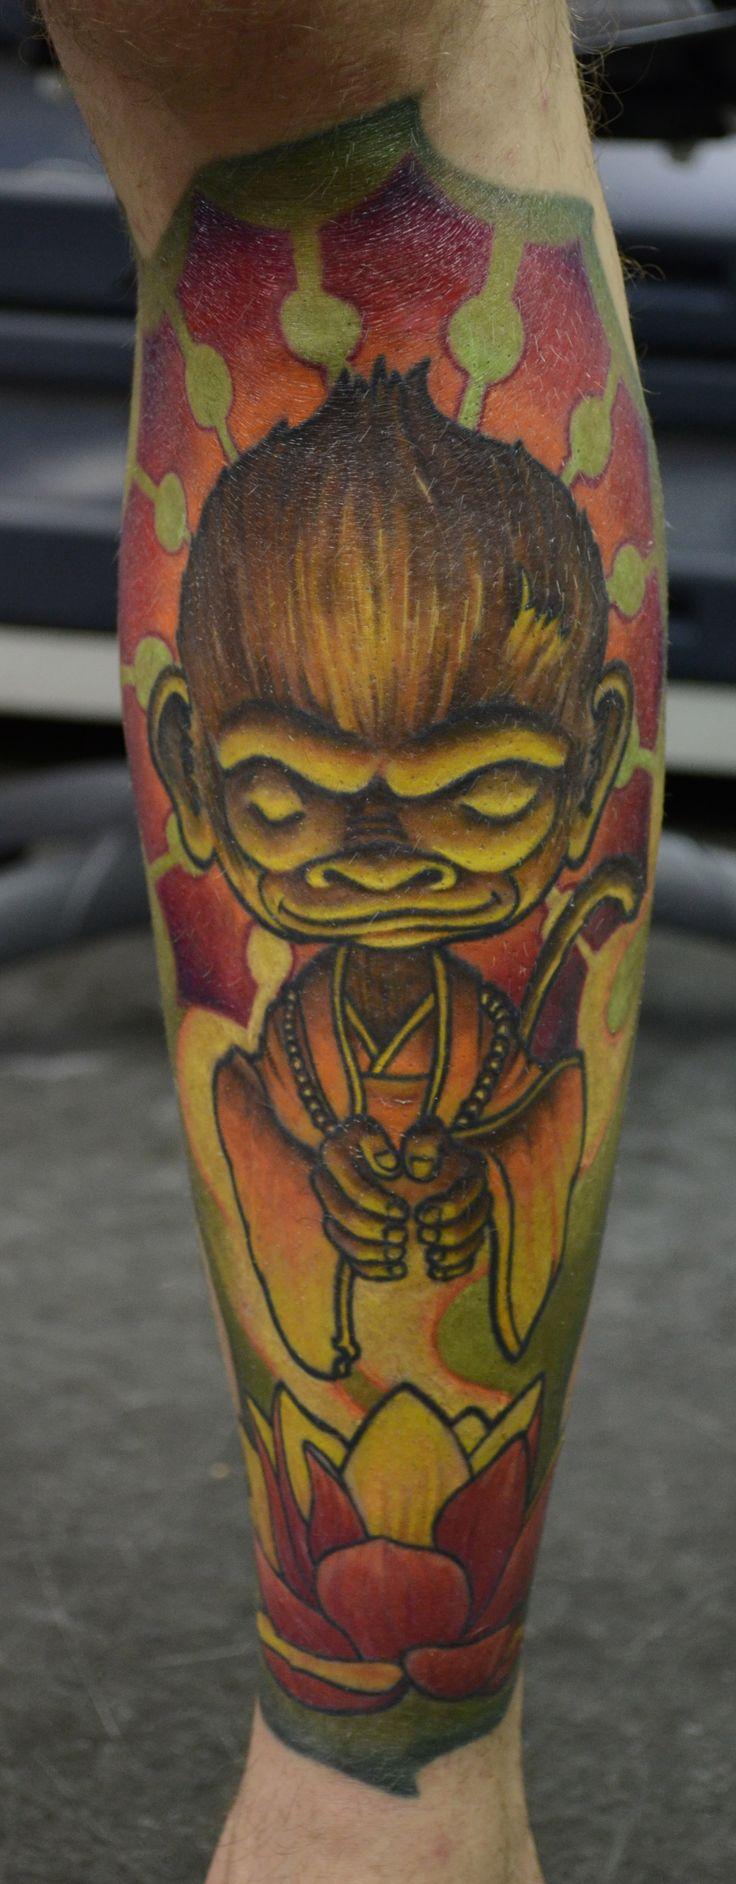 Buddha Monk monkey color leg sleeve design winner